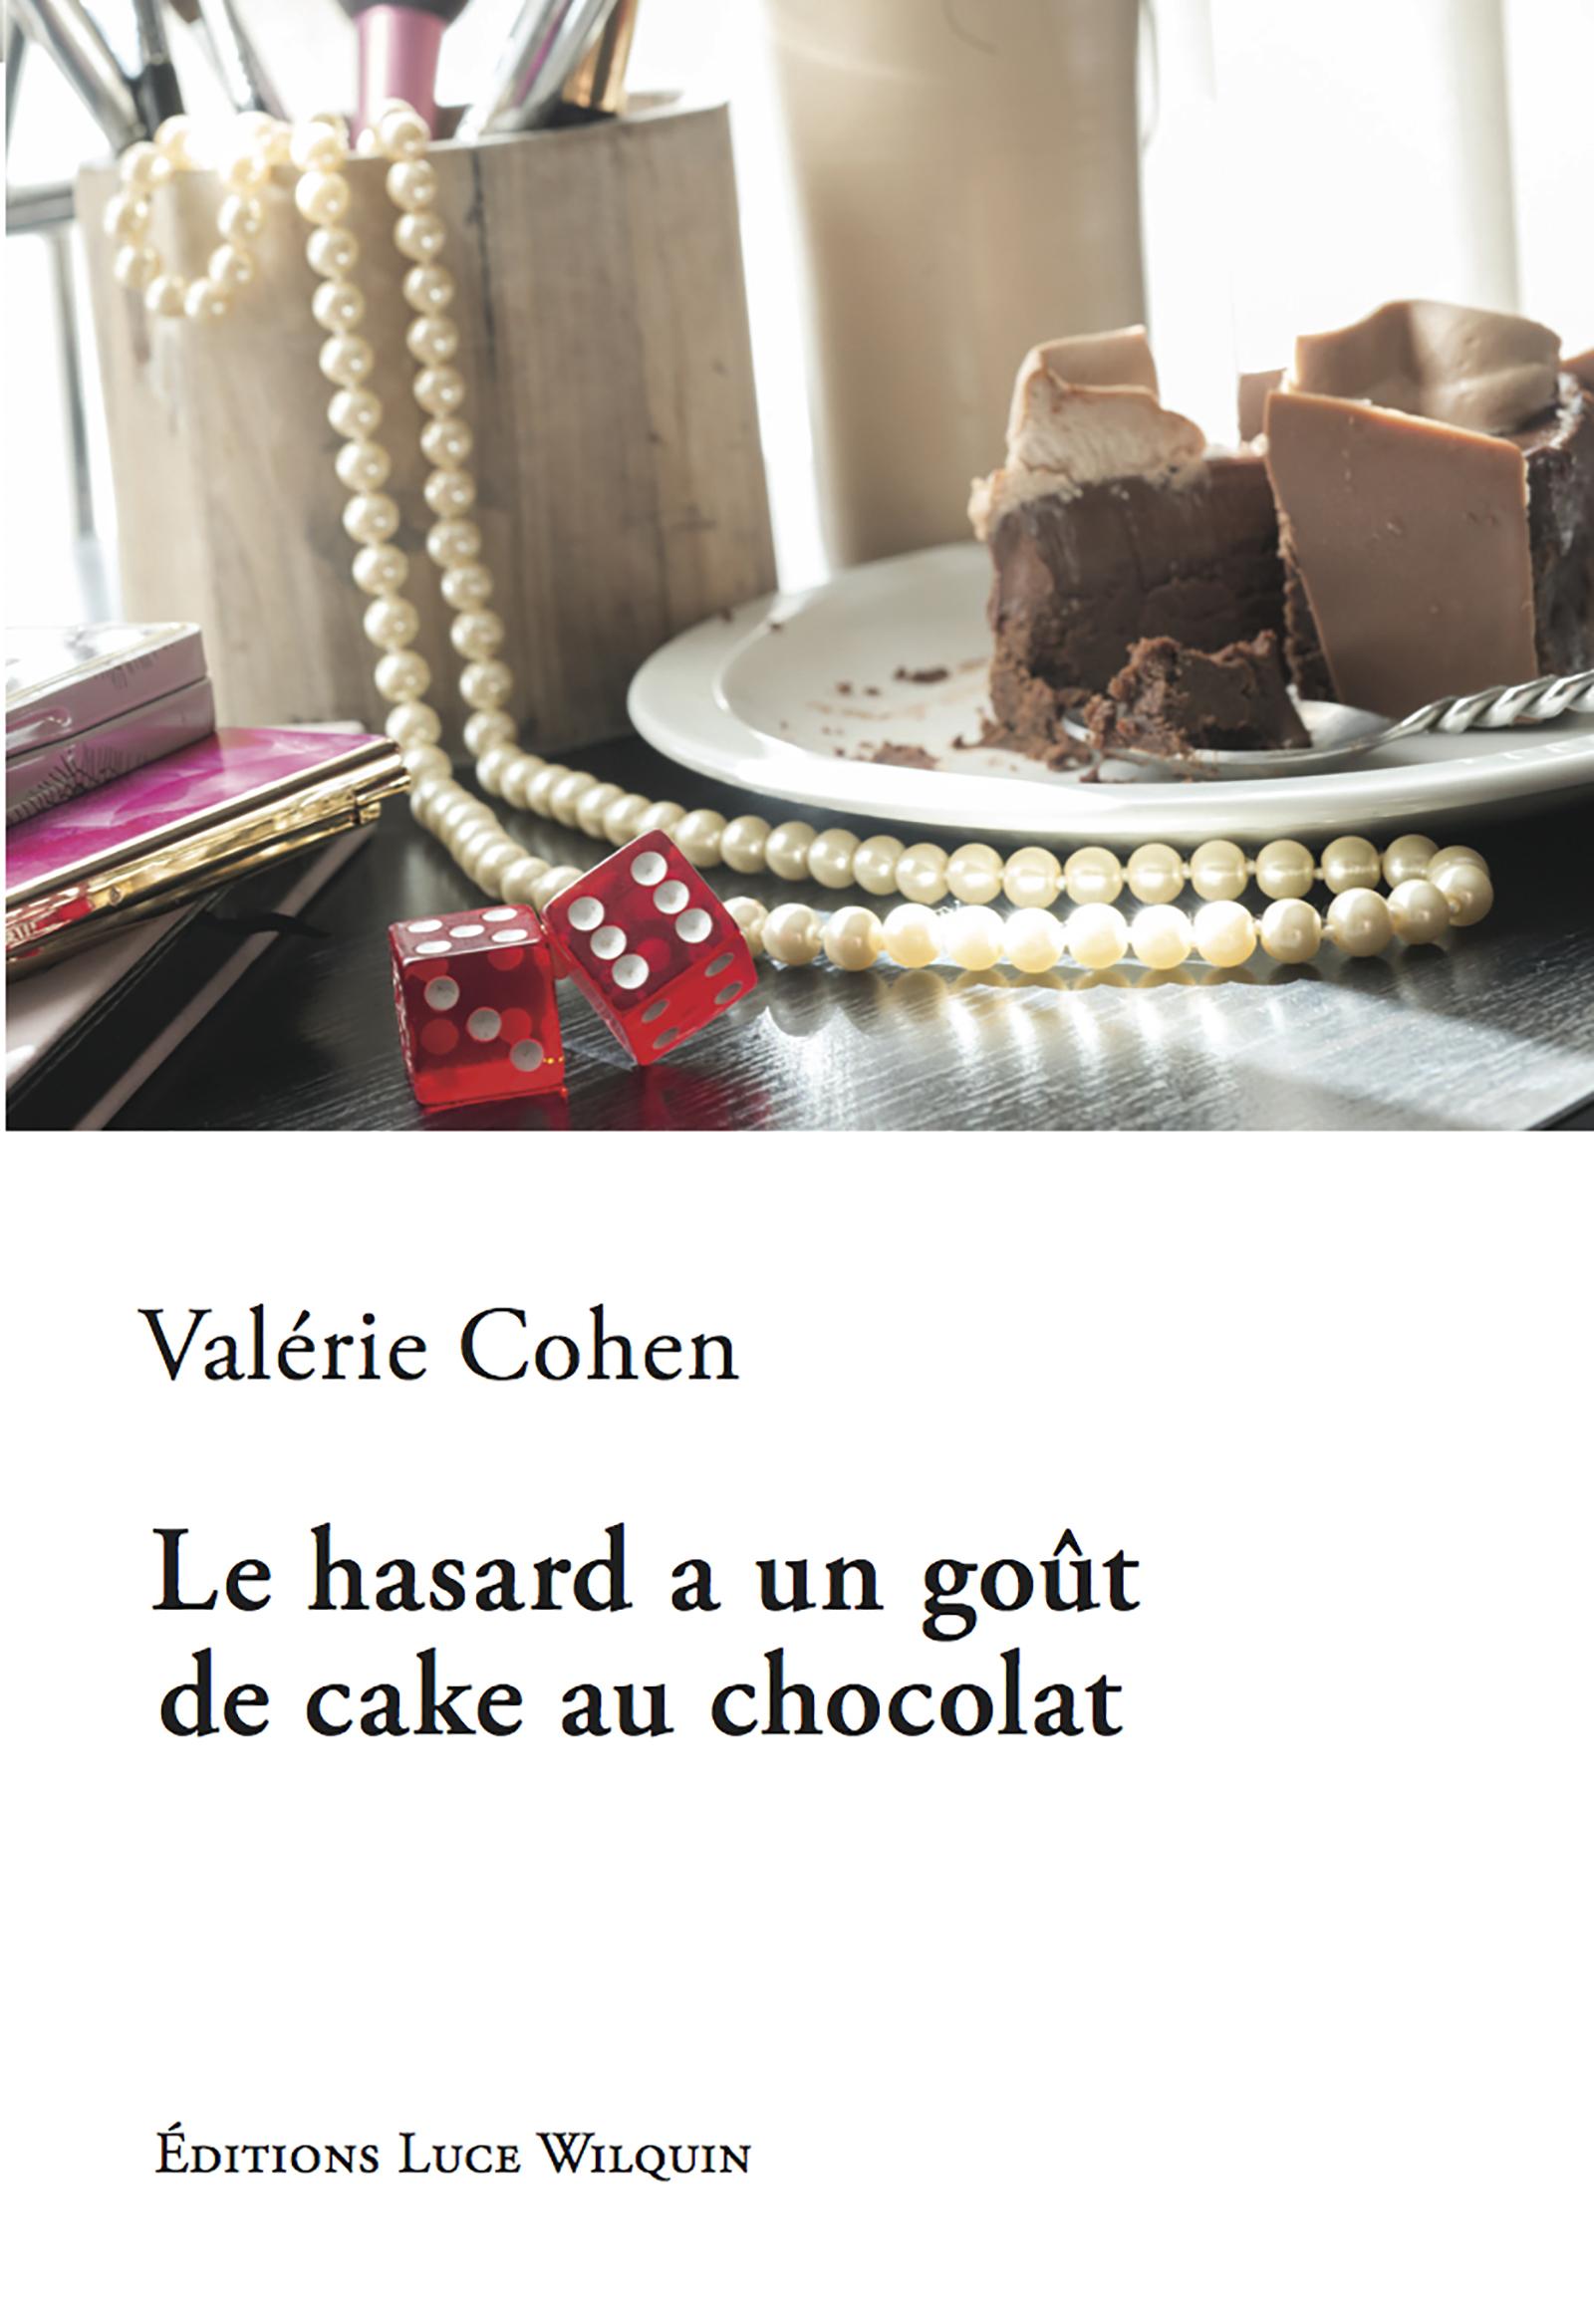 Le hasard a un goût de cake au chocolat